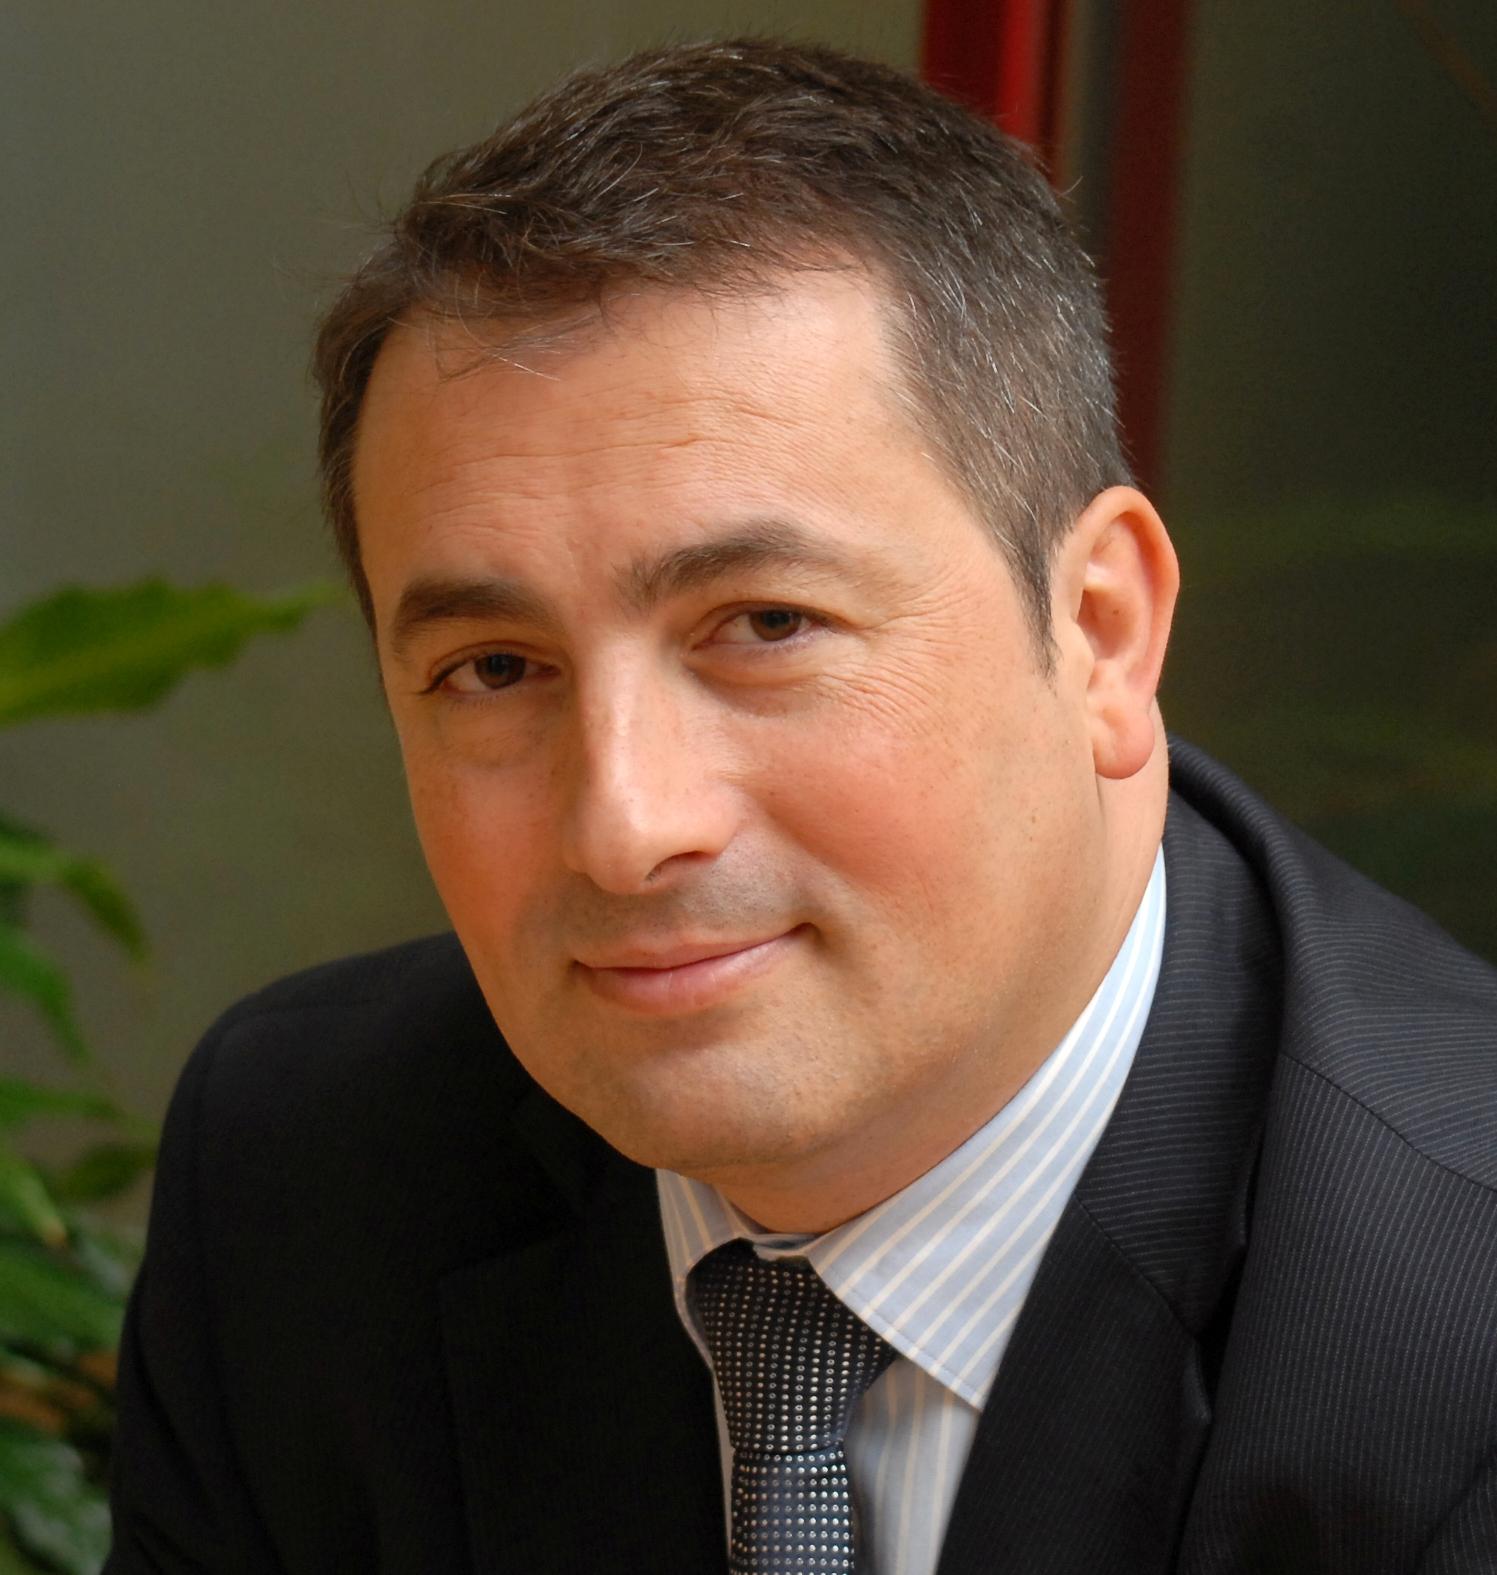 Antoni Ballabriga